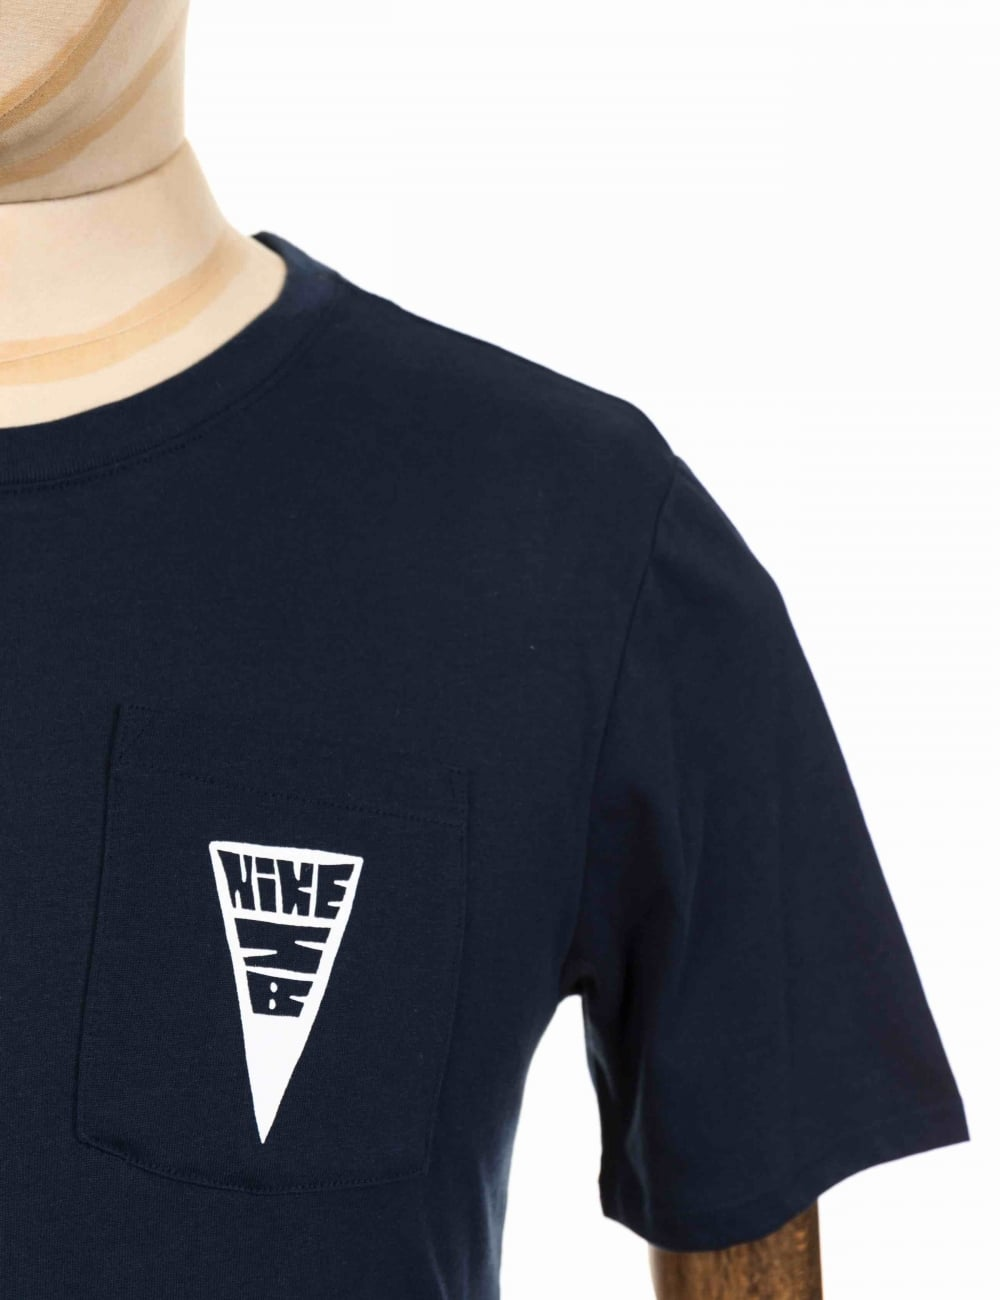 Dry Fit Triangle Pocket Logo T-shirt - Obsidian